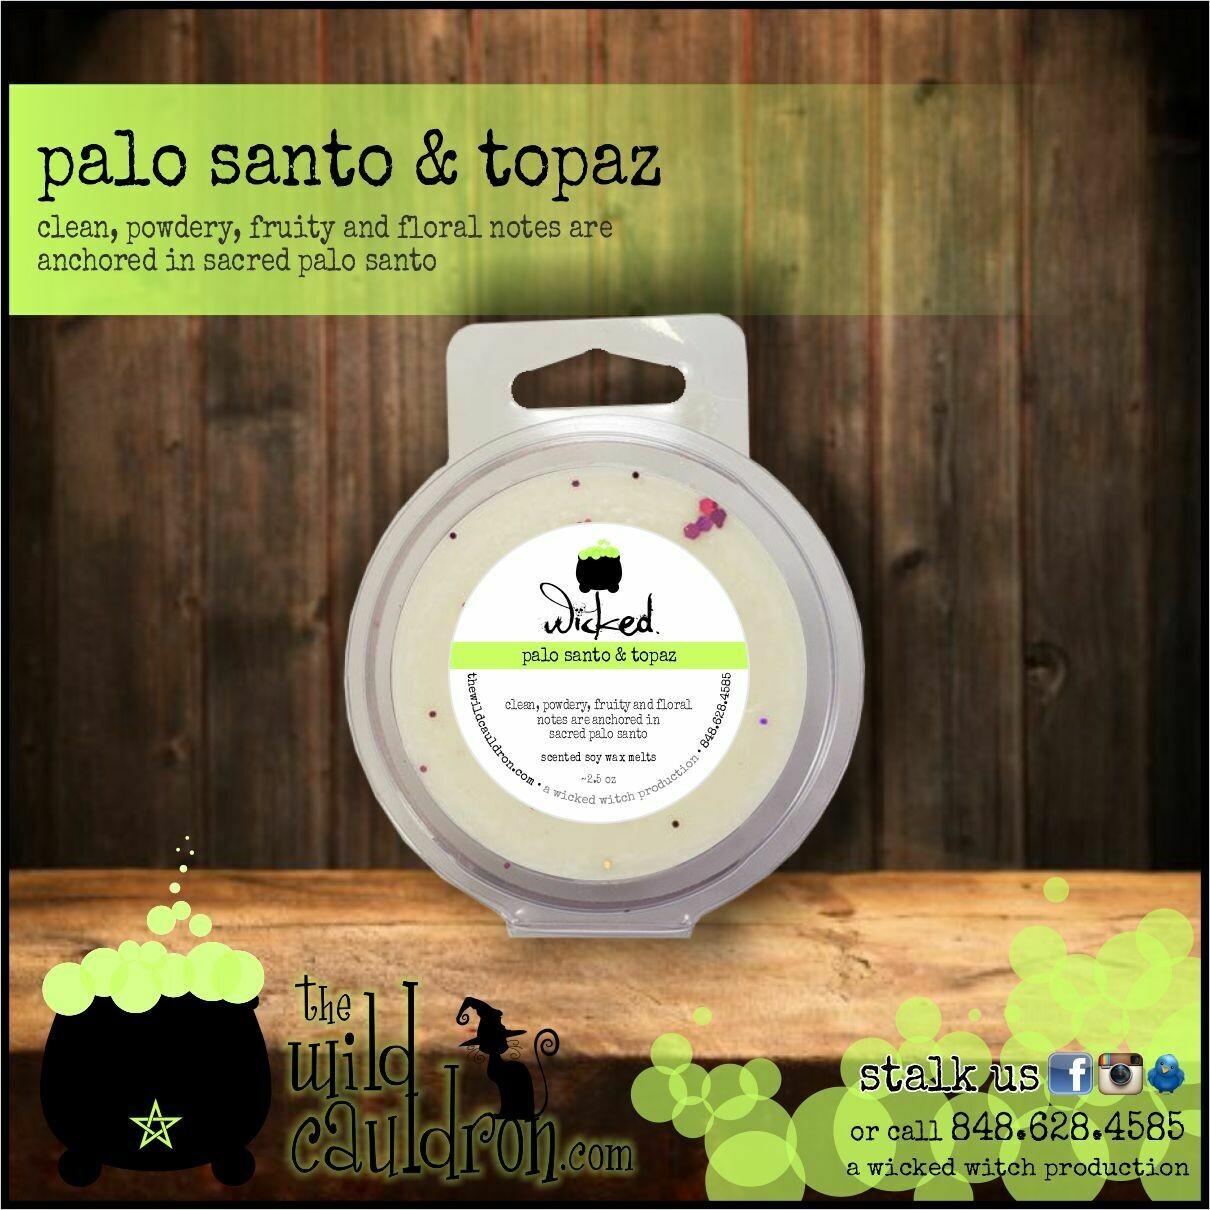 Palo Santo and Topaz Wicked Wax Melts